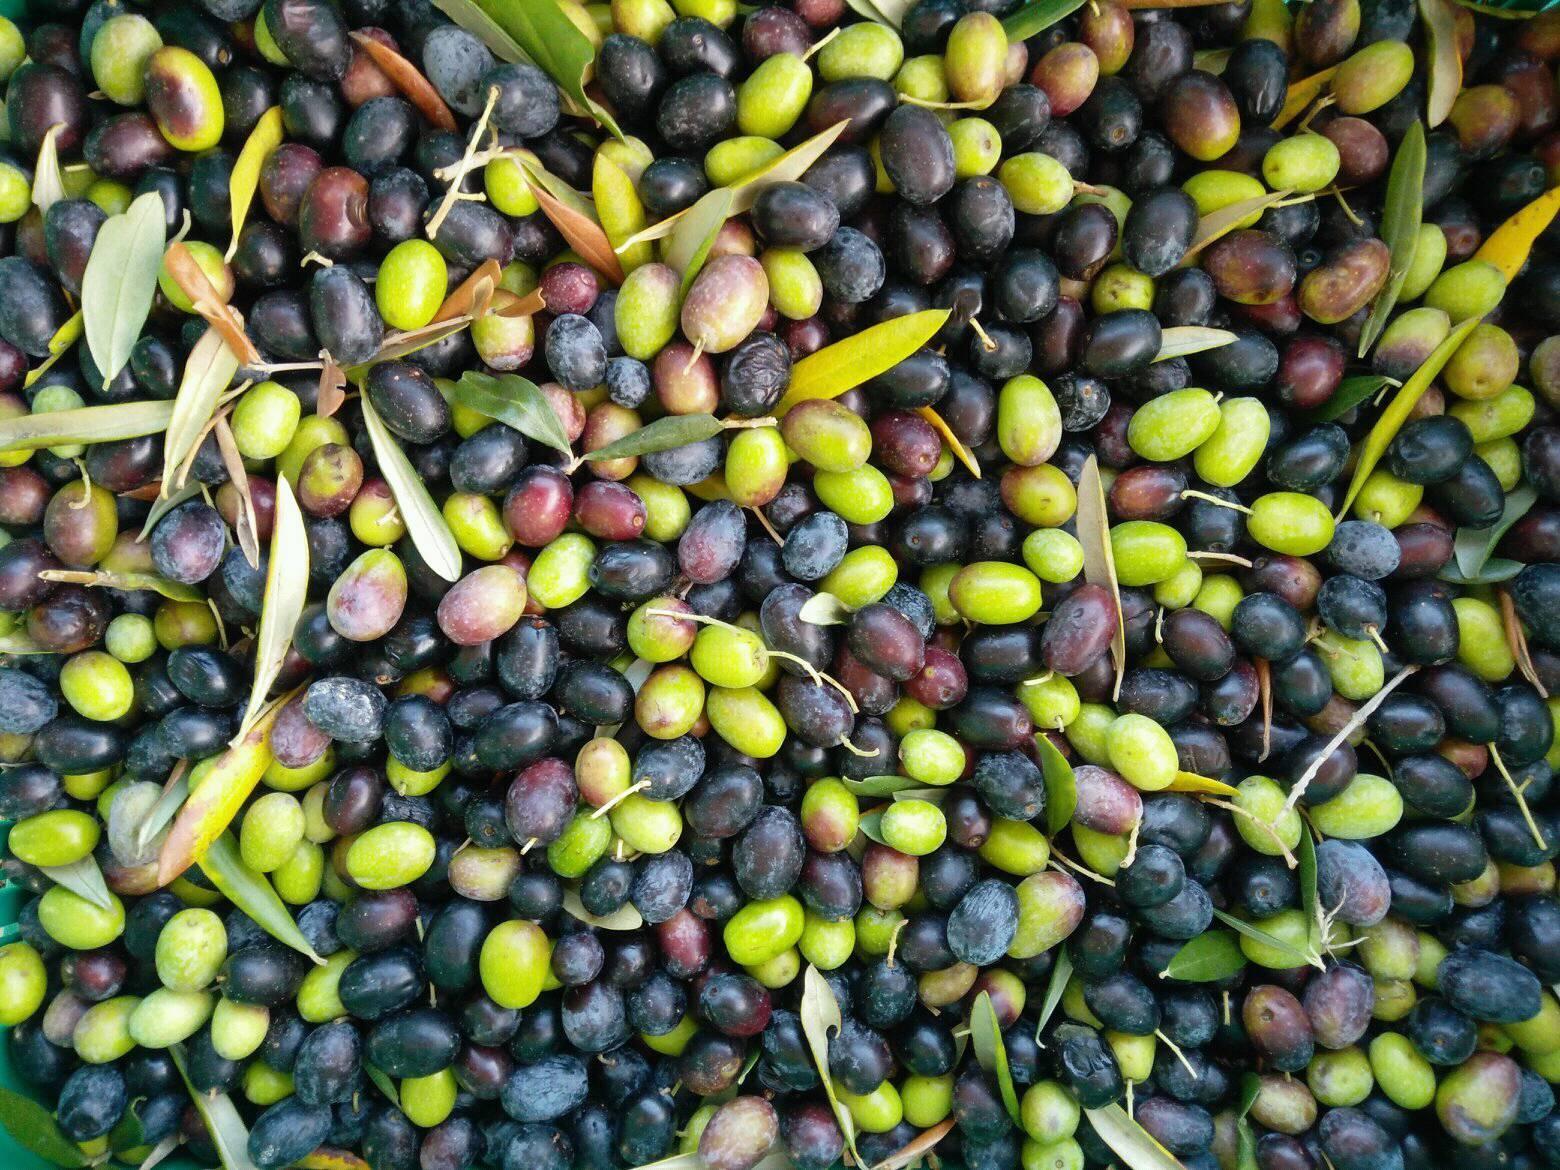 podere_lemniscata_olive.jpg